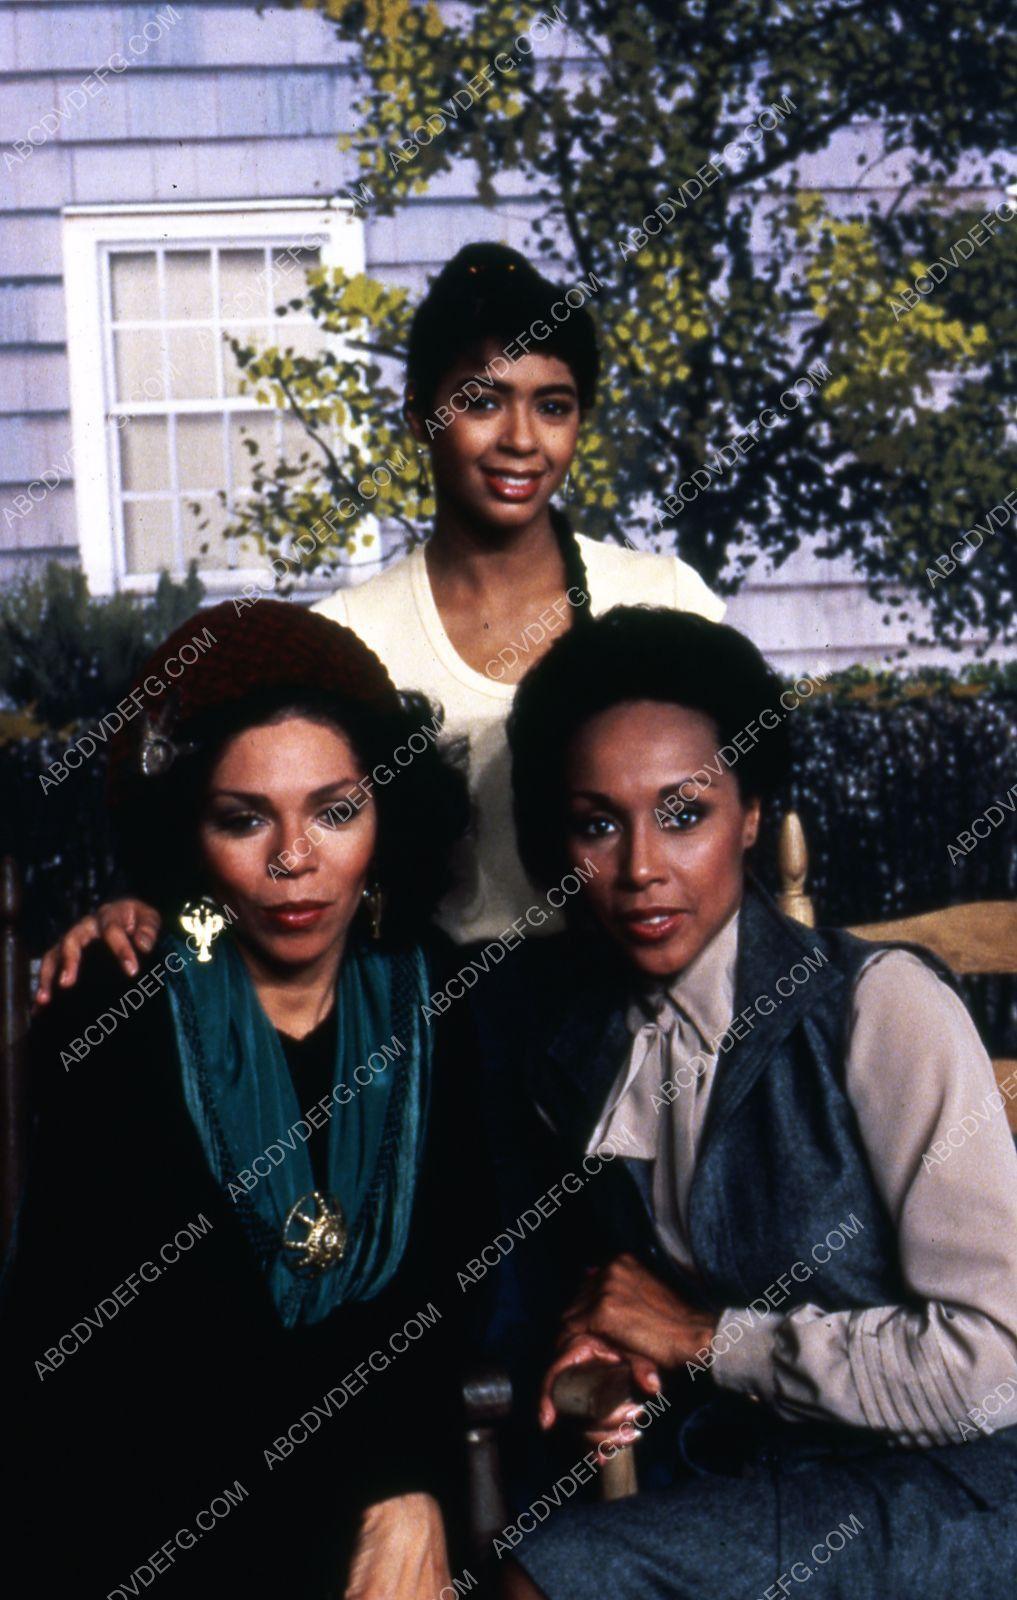 Diahann Carroll Irene Cara Rosalind Cash TVM Sister Sister 35m-1977